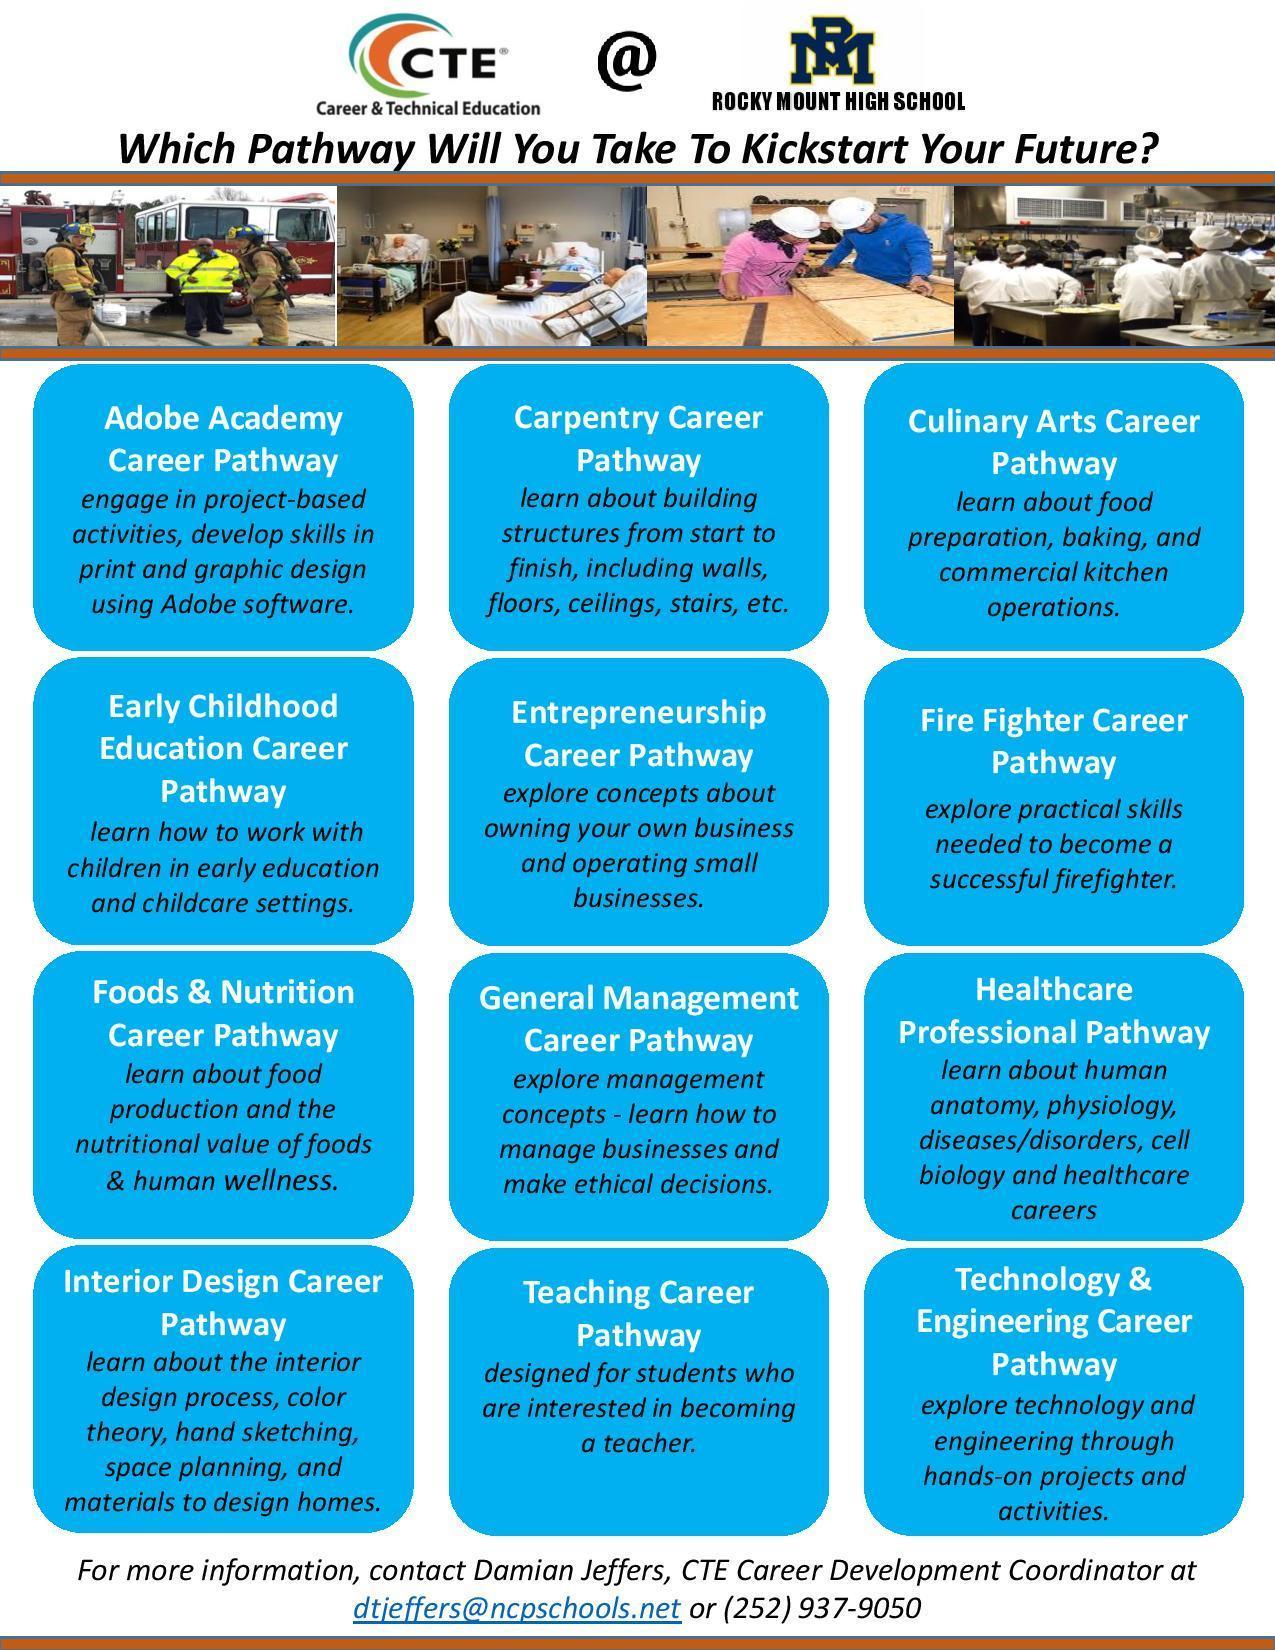 CTE Career Pathways at RMHS